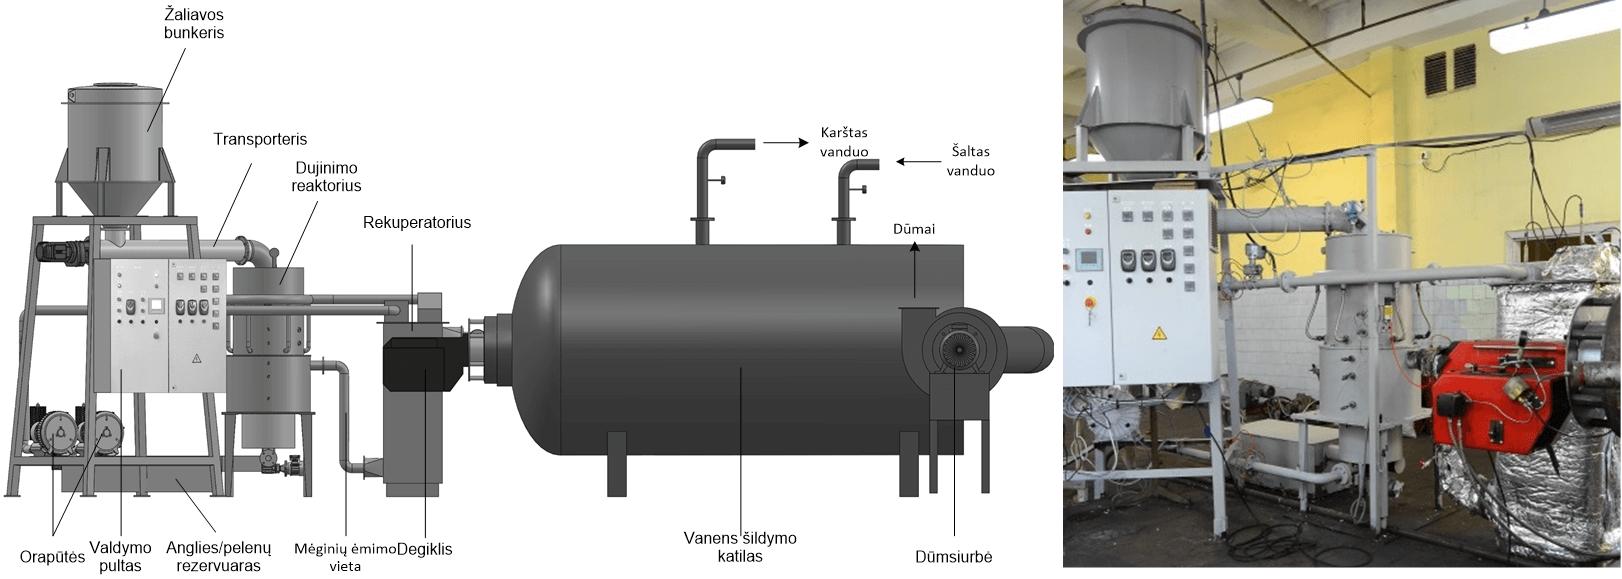 INODUMTECH - sewage sludge utilisation solution